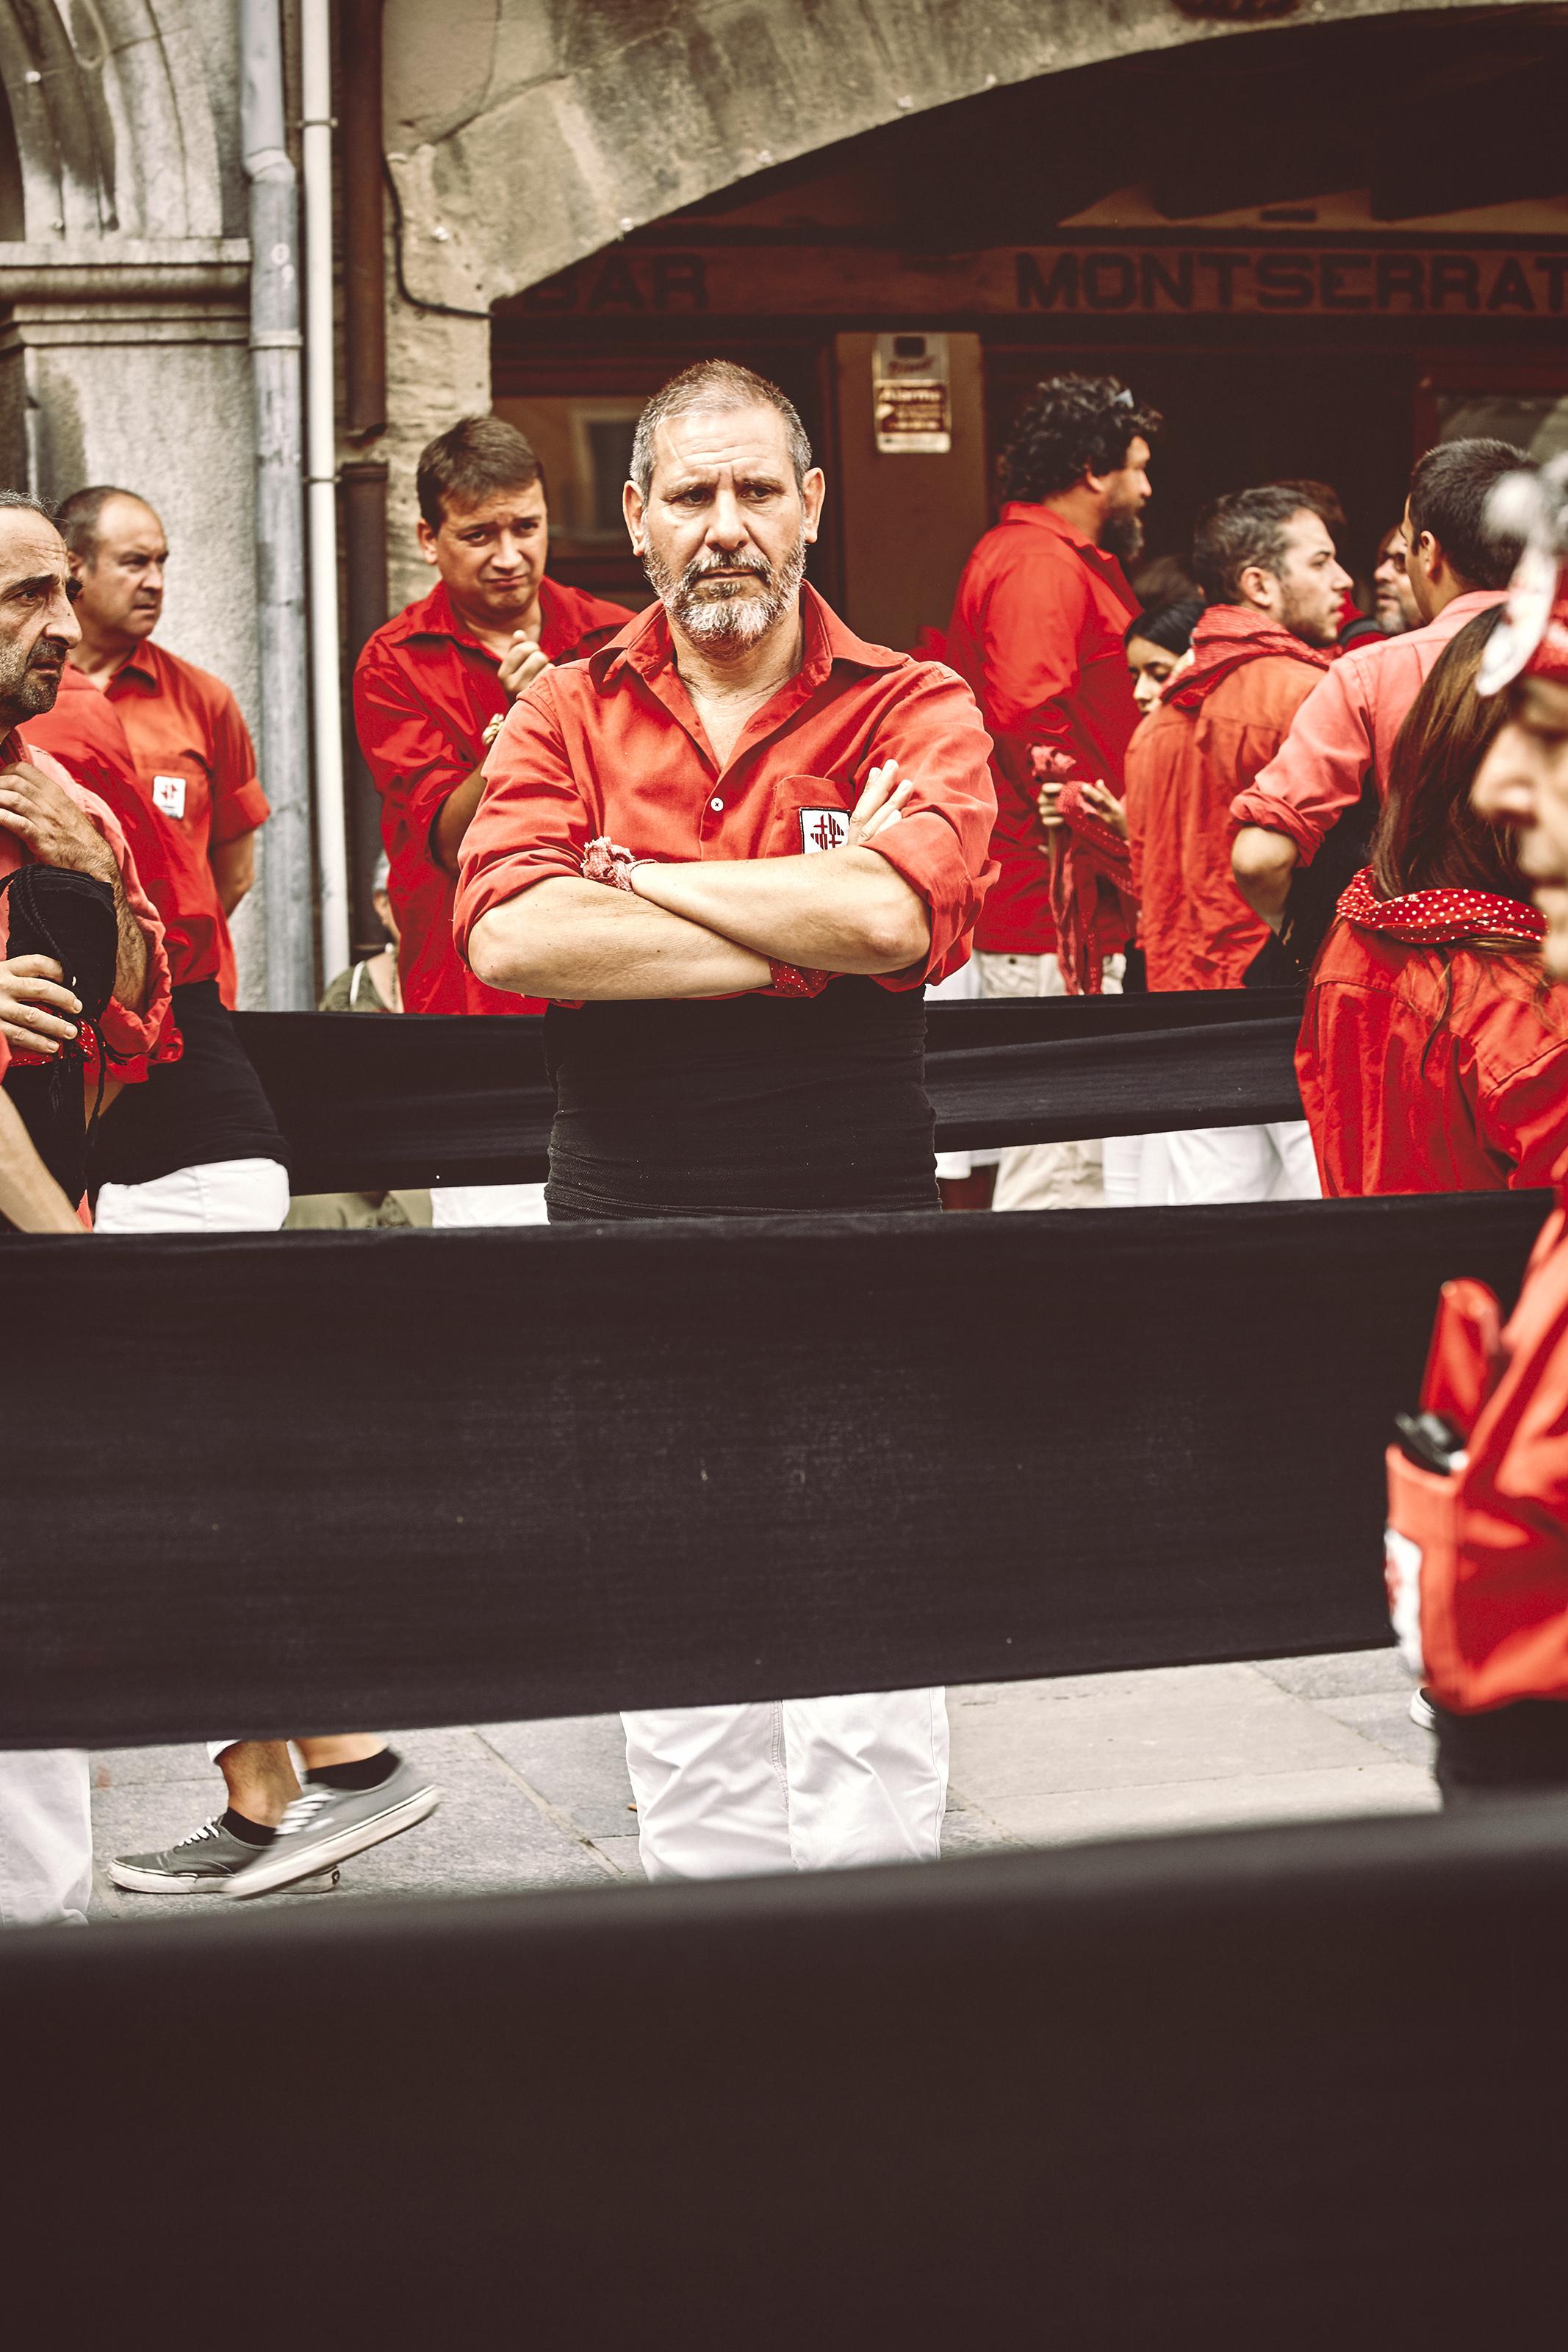 Casteller preparing himself in Barcelona